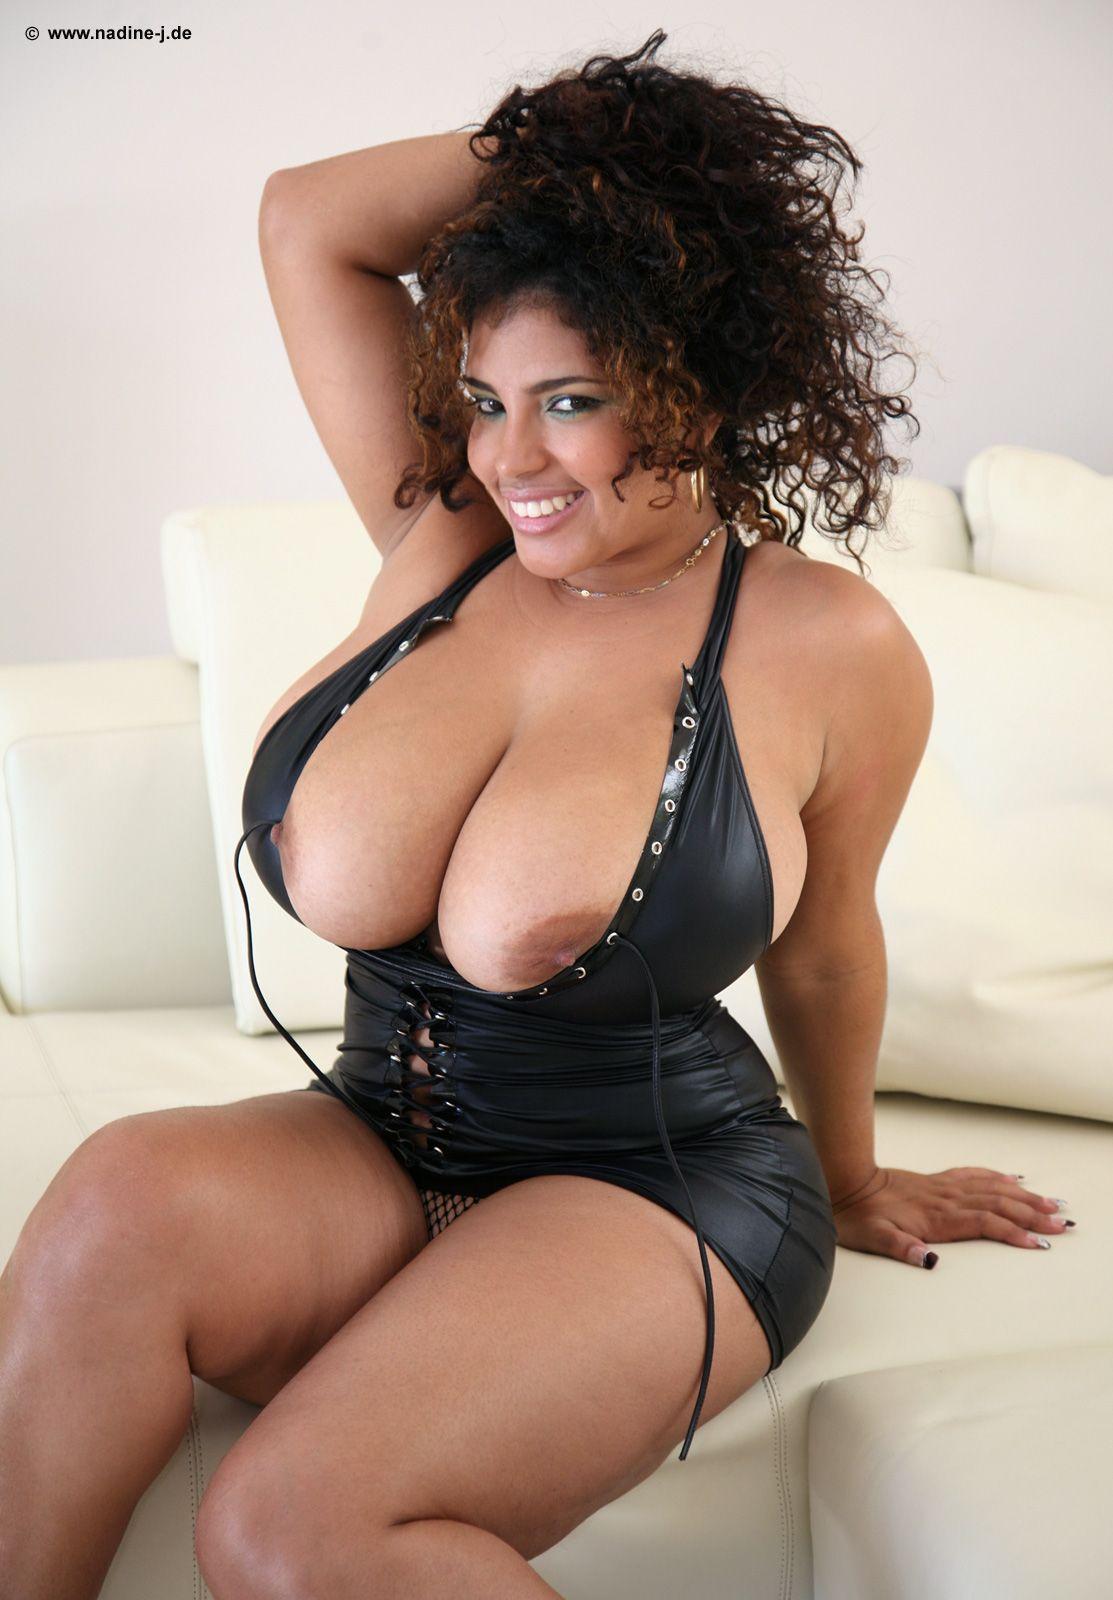 Consider, that Miss izzy big tits